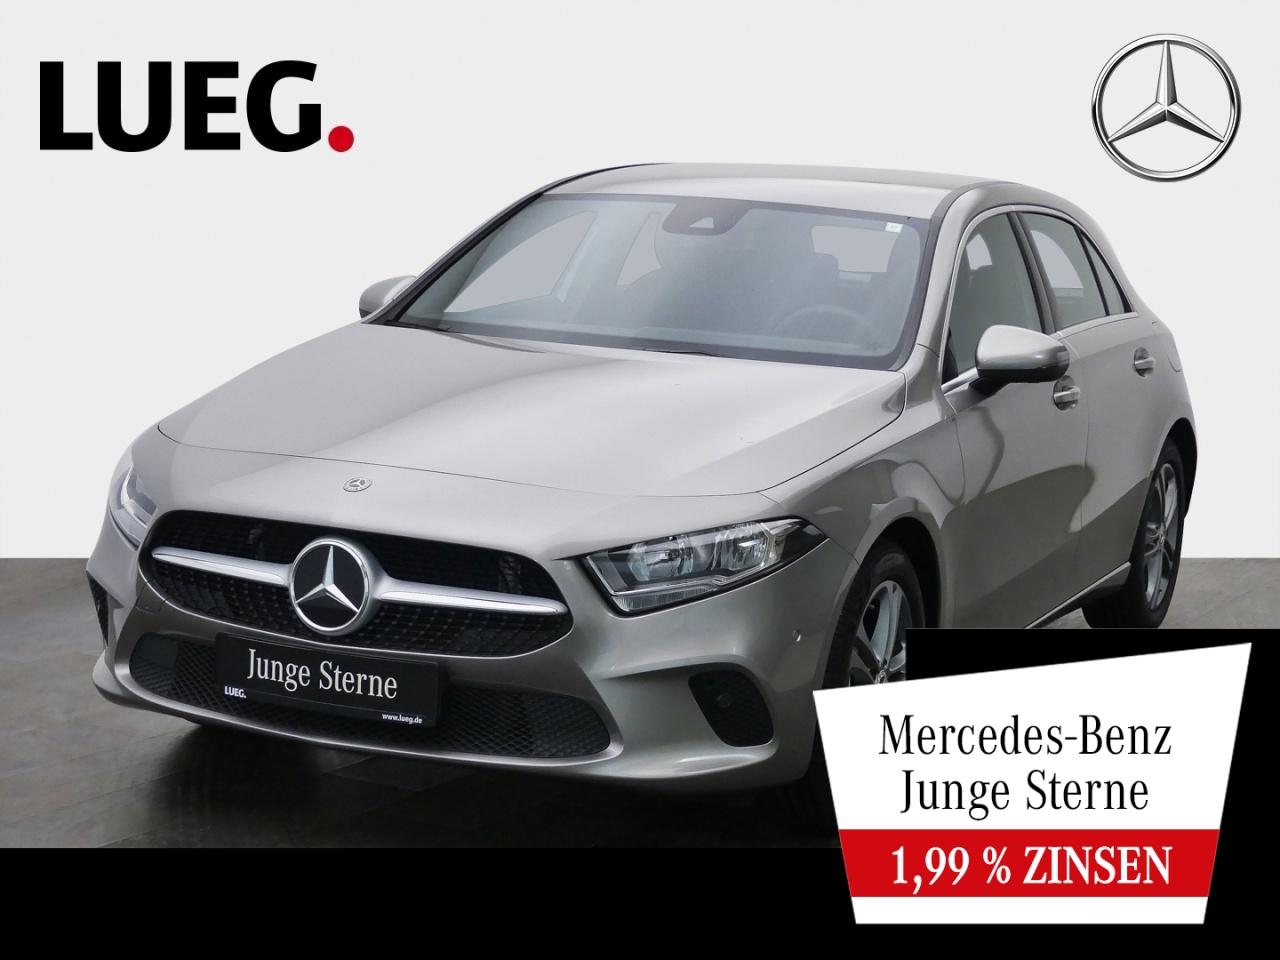 Mercedes-Benz A 180 Progressive+MBUX+NavPrm+Spur+ParkAssistent, Jahr 2019, Benzin